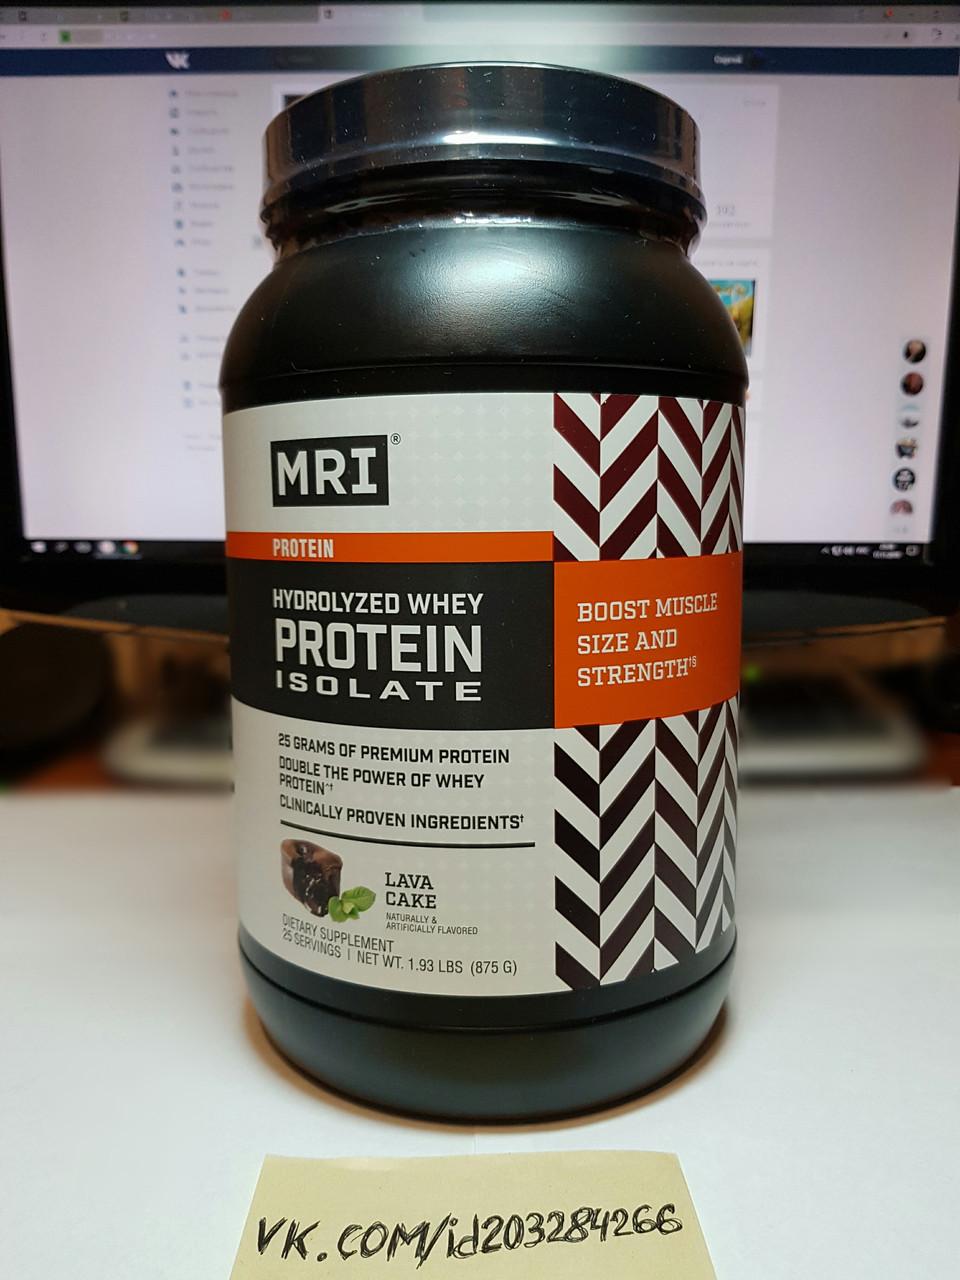 Гидролизат протеина MRI Hydrolyzed Whey Protein Isolate 875g